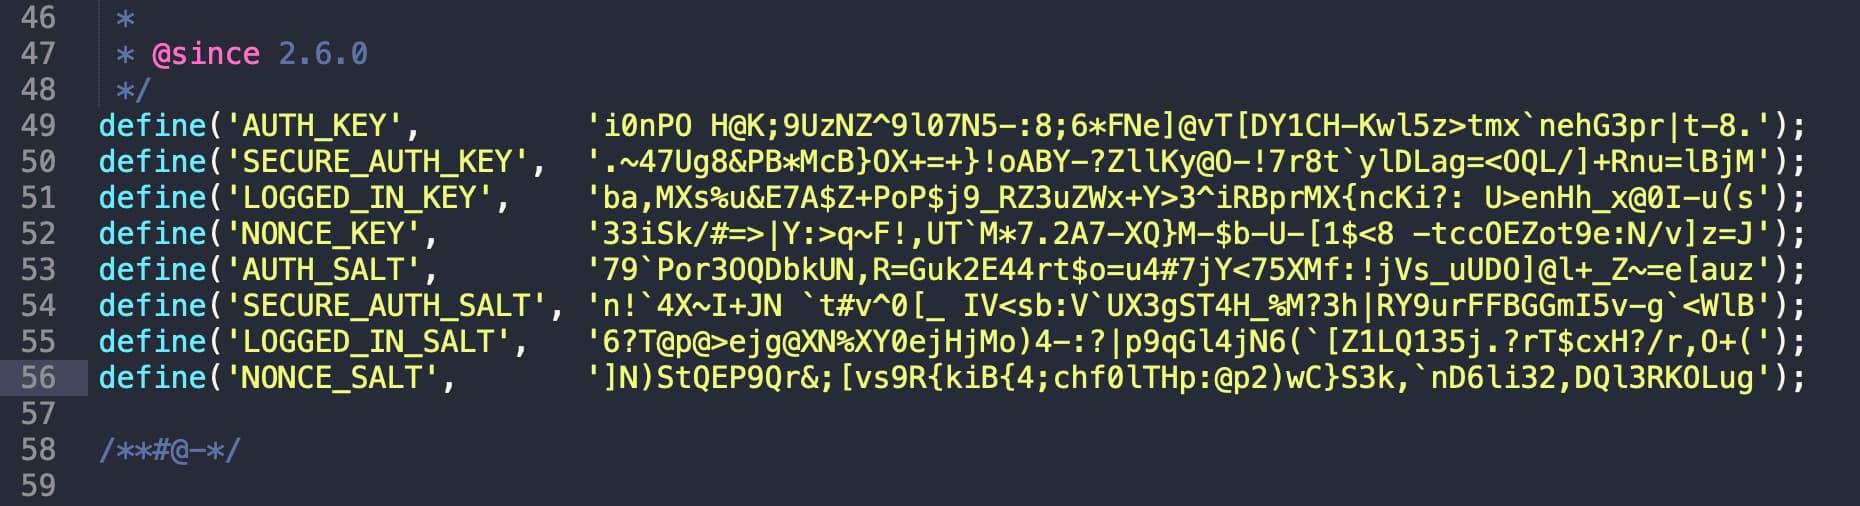 WordPress authnetication keys and salts